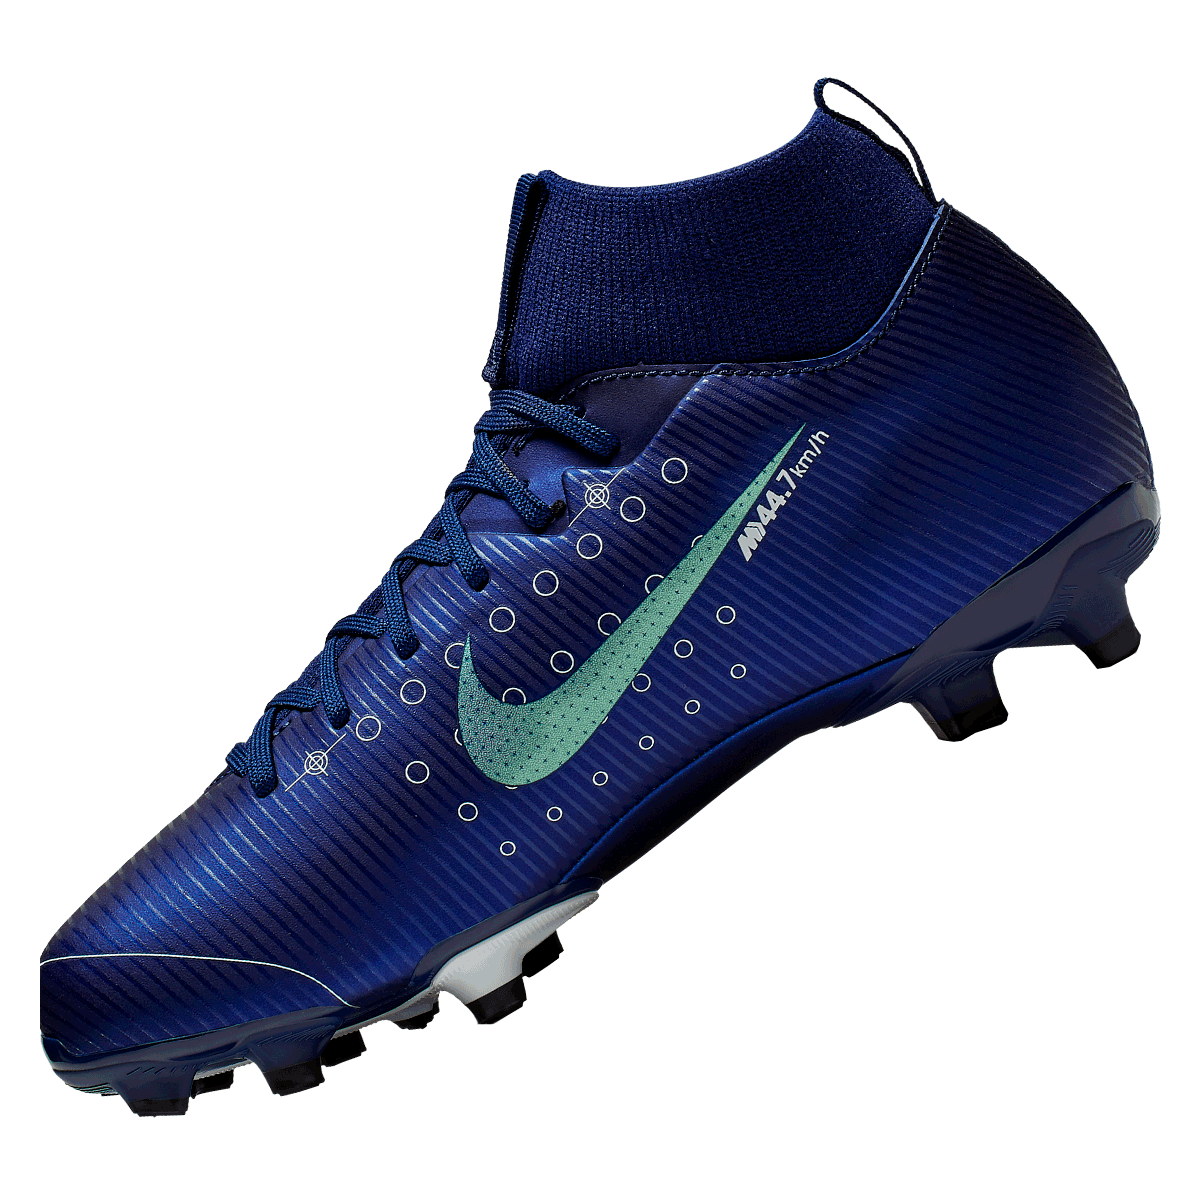 Nike kinderen voetbalschoenen Mercurial Superfly VII JR Academy MDS FGMG donkerblauwwit